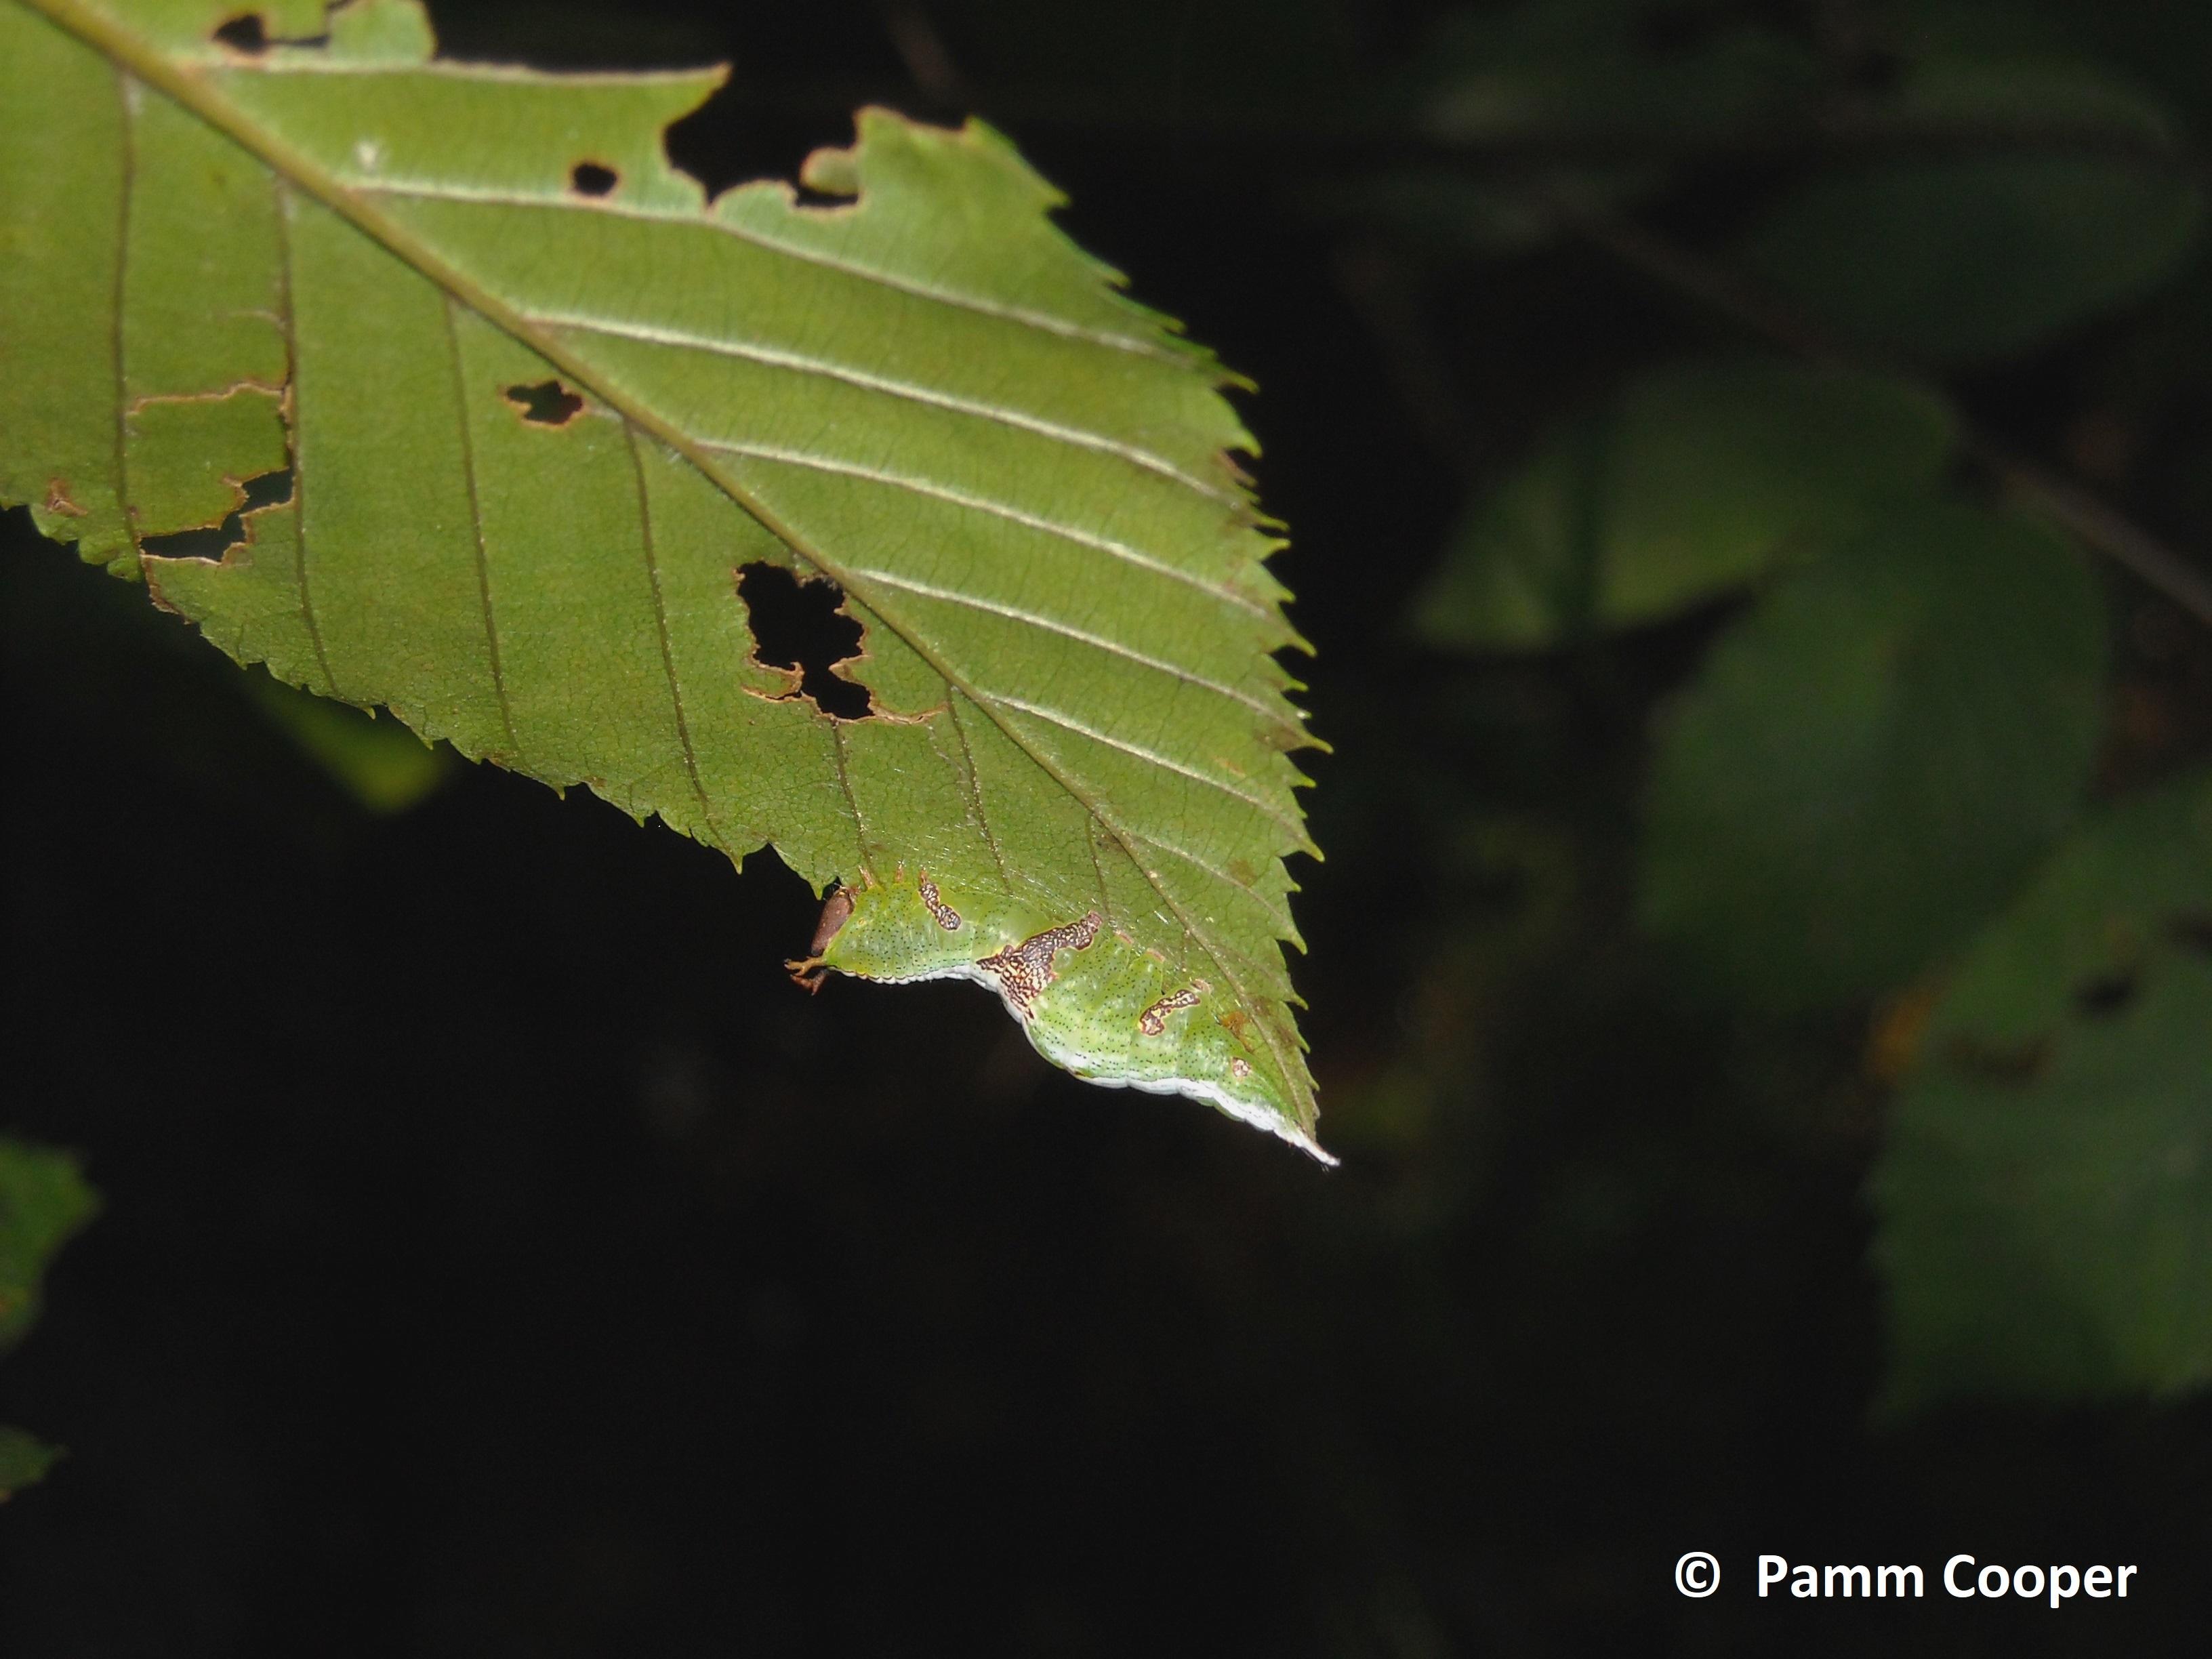 wavy-lined-heteocampa-2-on-leaf-edge